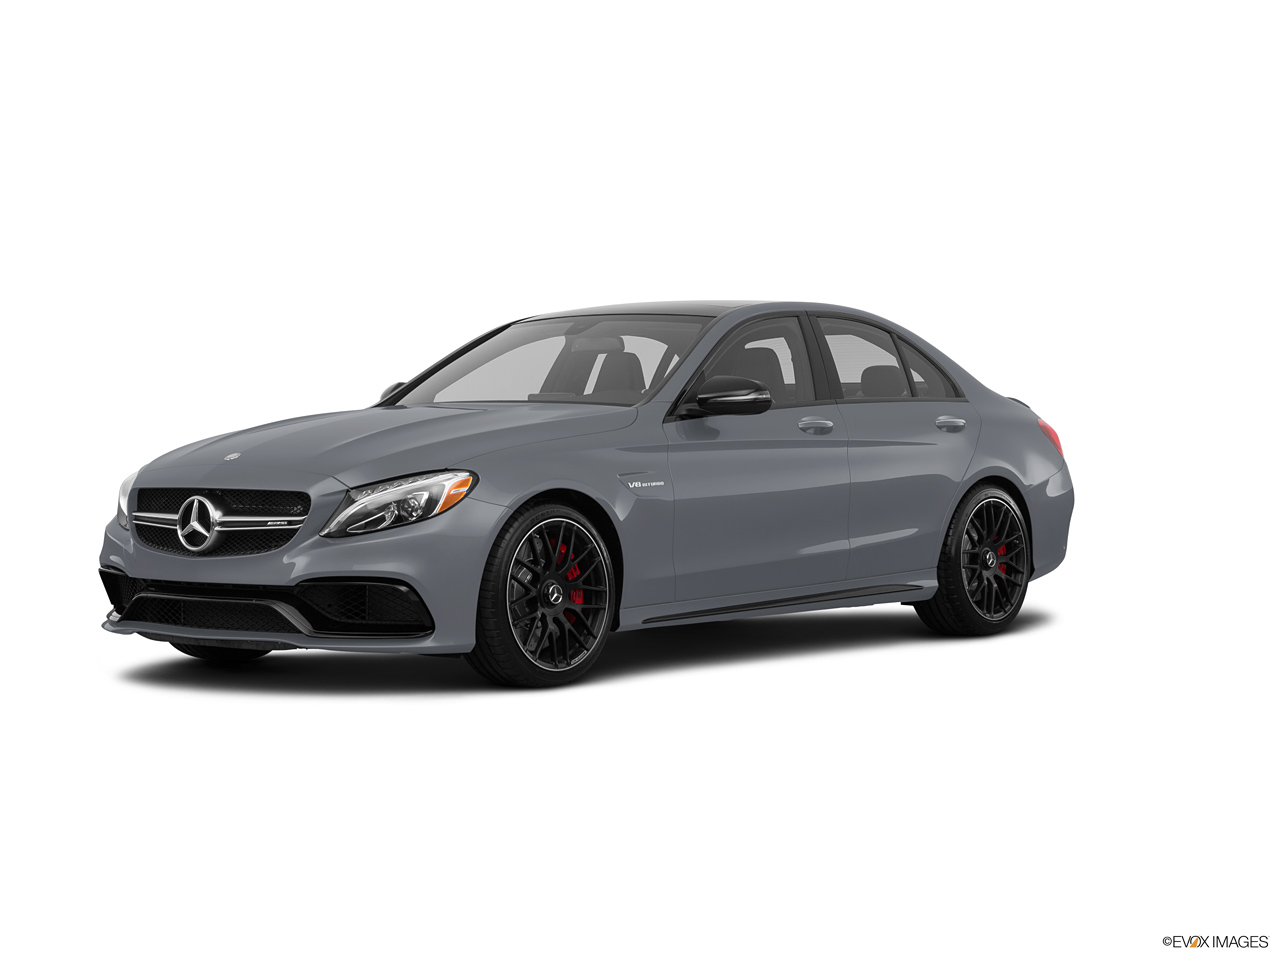 Car pictures list for mercedes benz c class 2017 c 63 s for Mercedes benz payment estimator